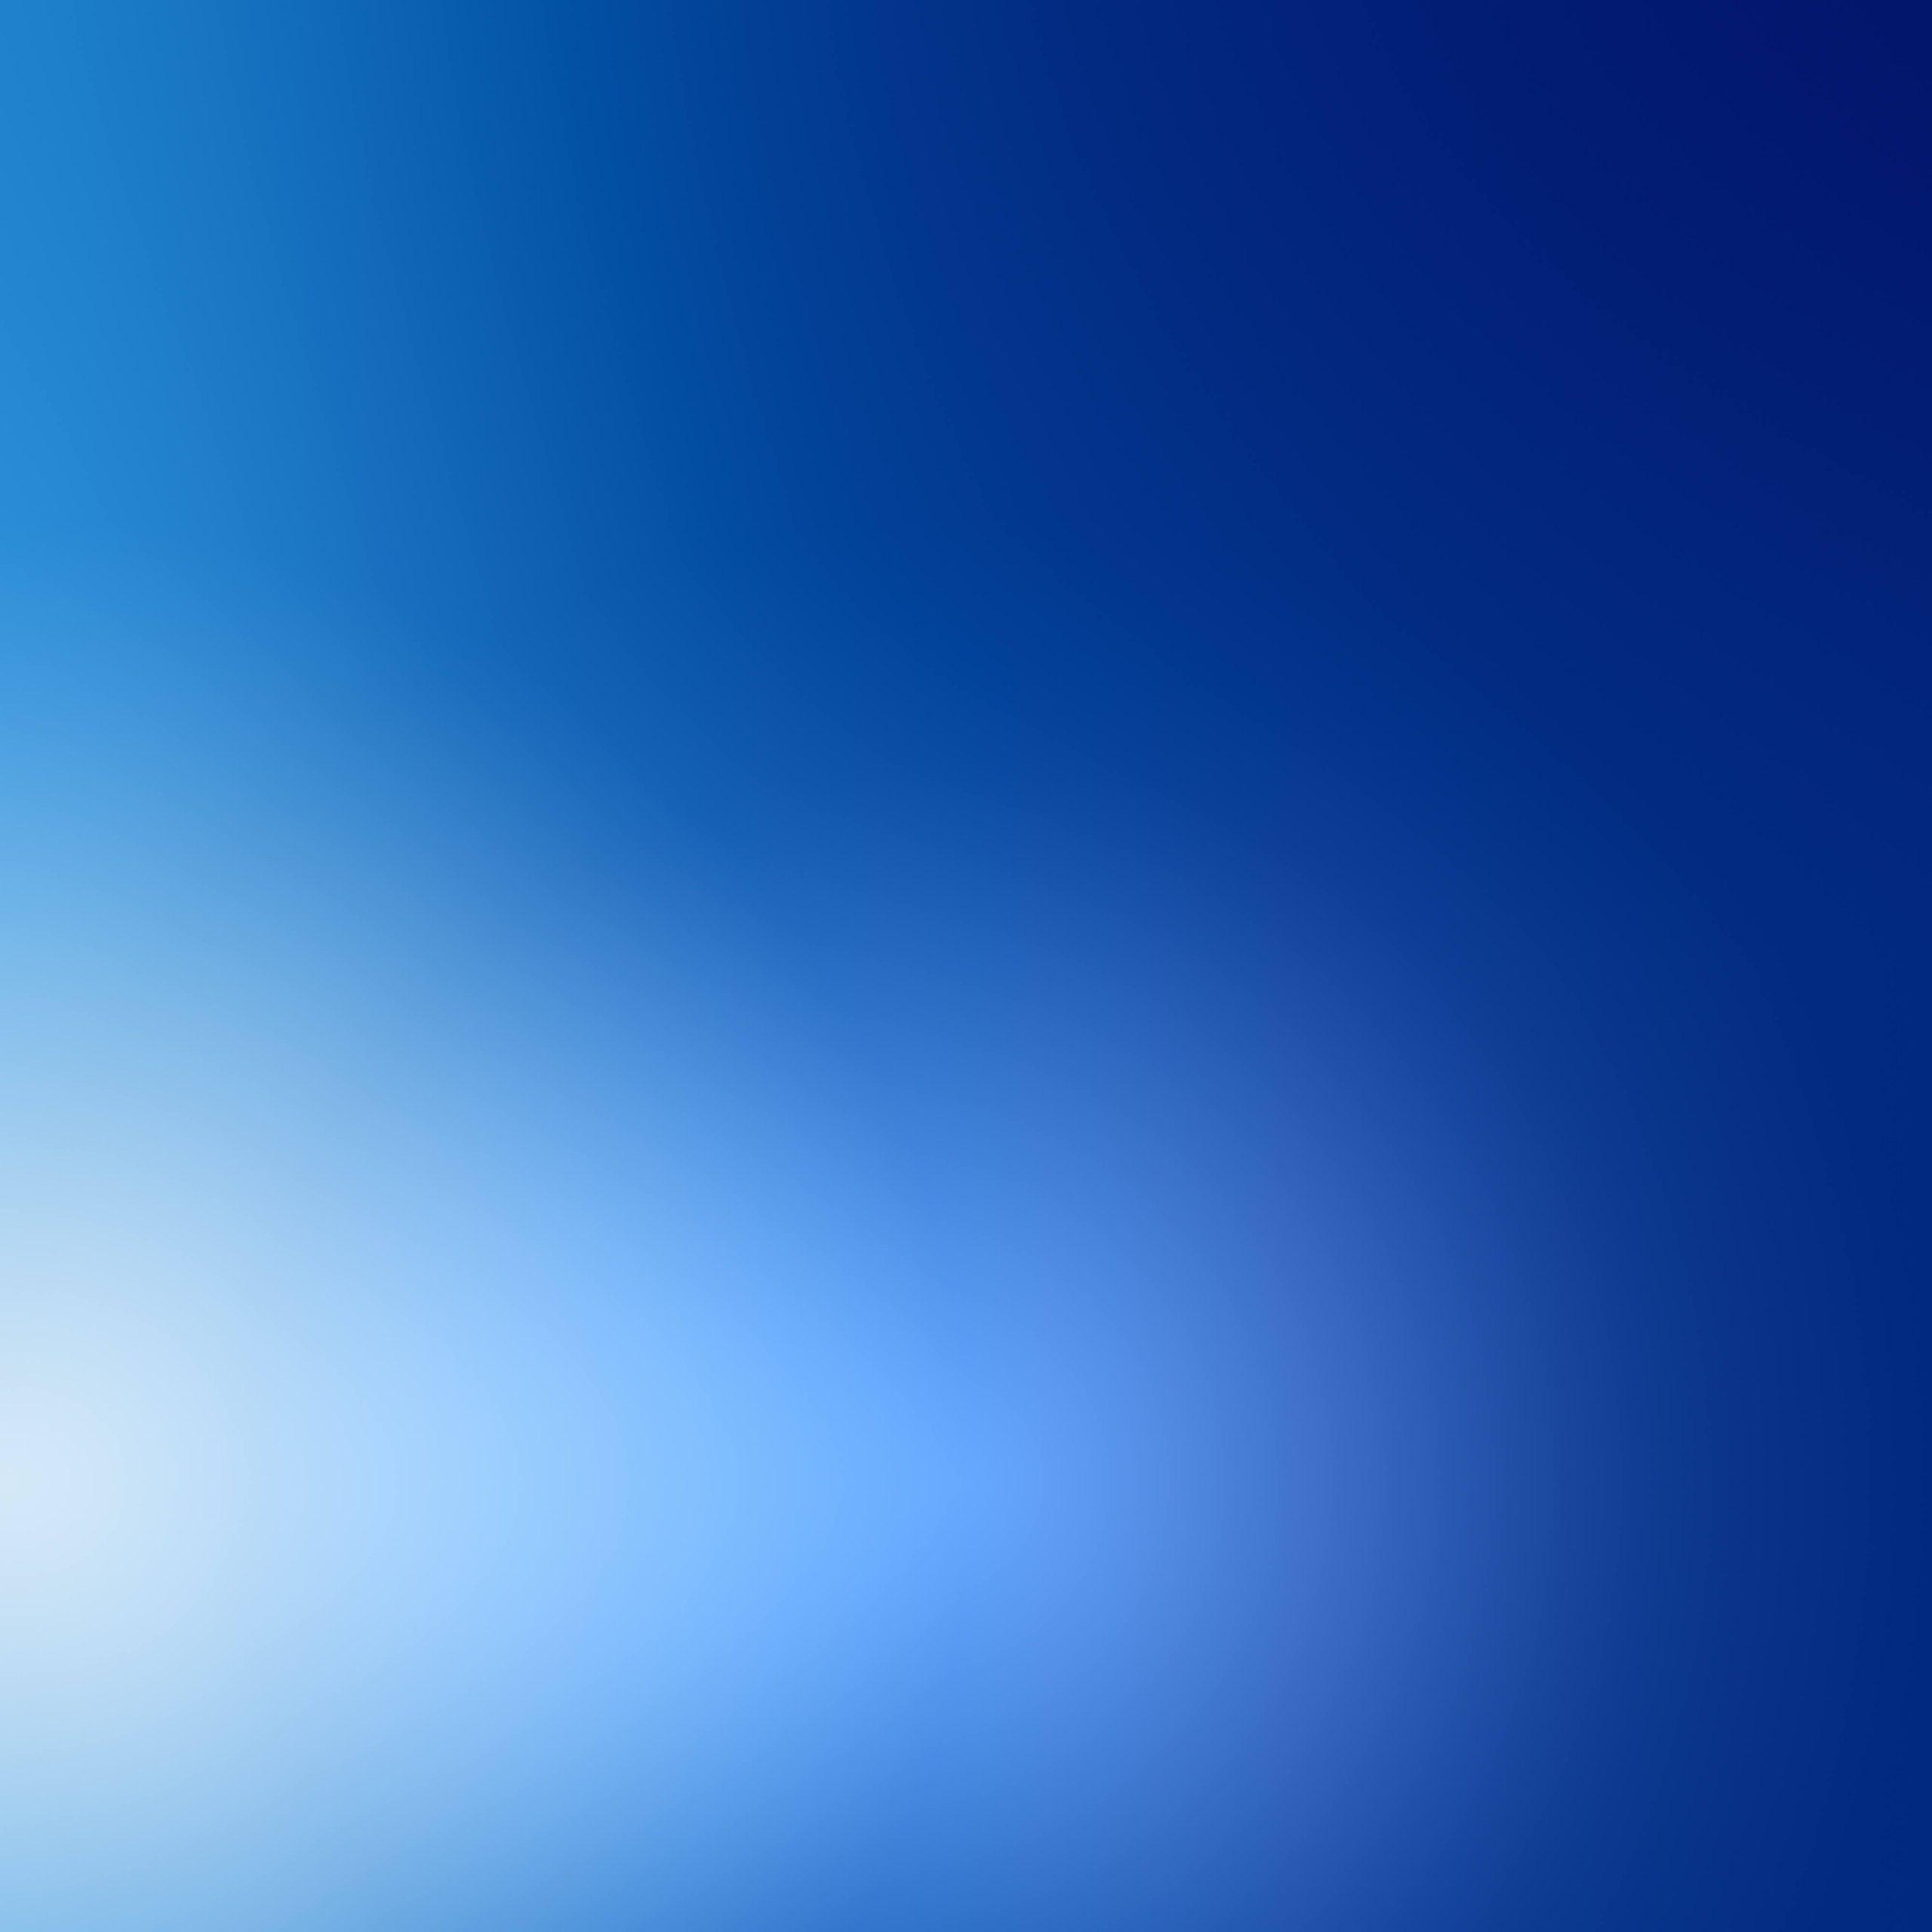 blue hd Windows 10x Wallpaper